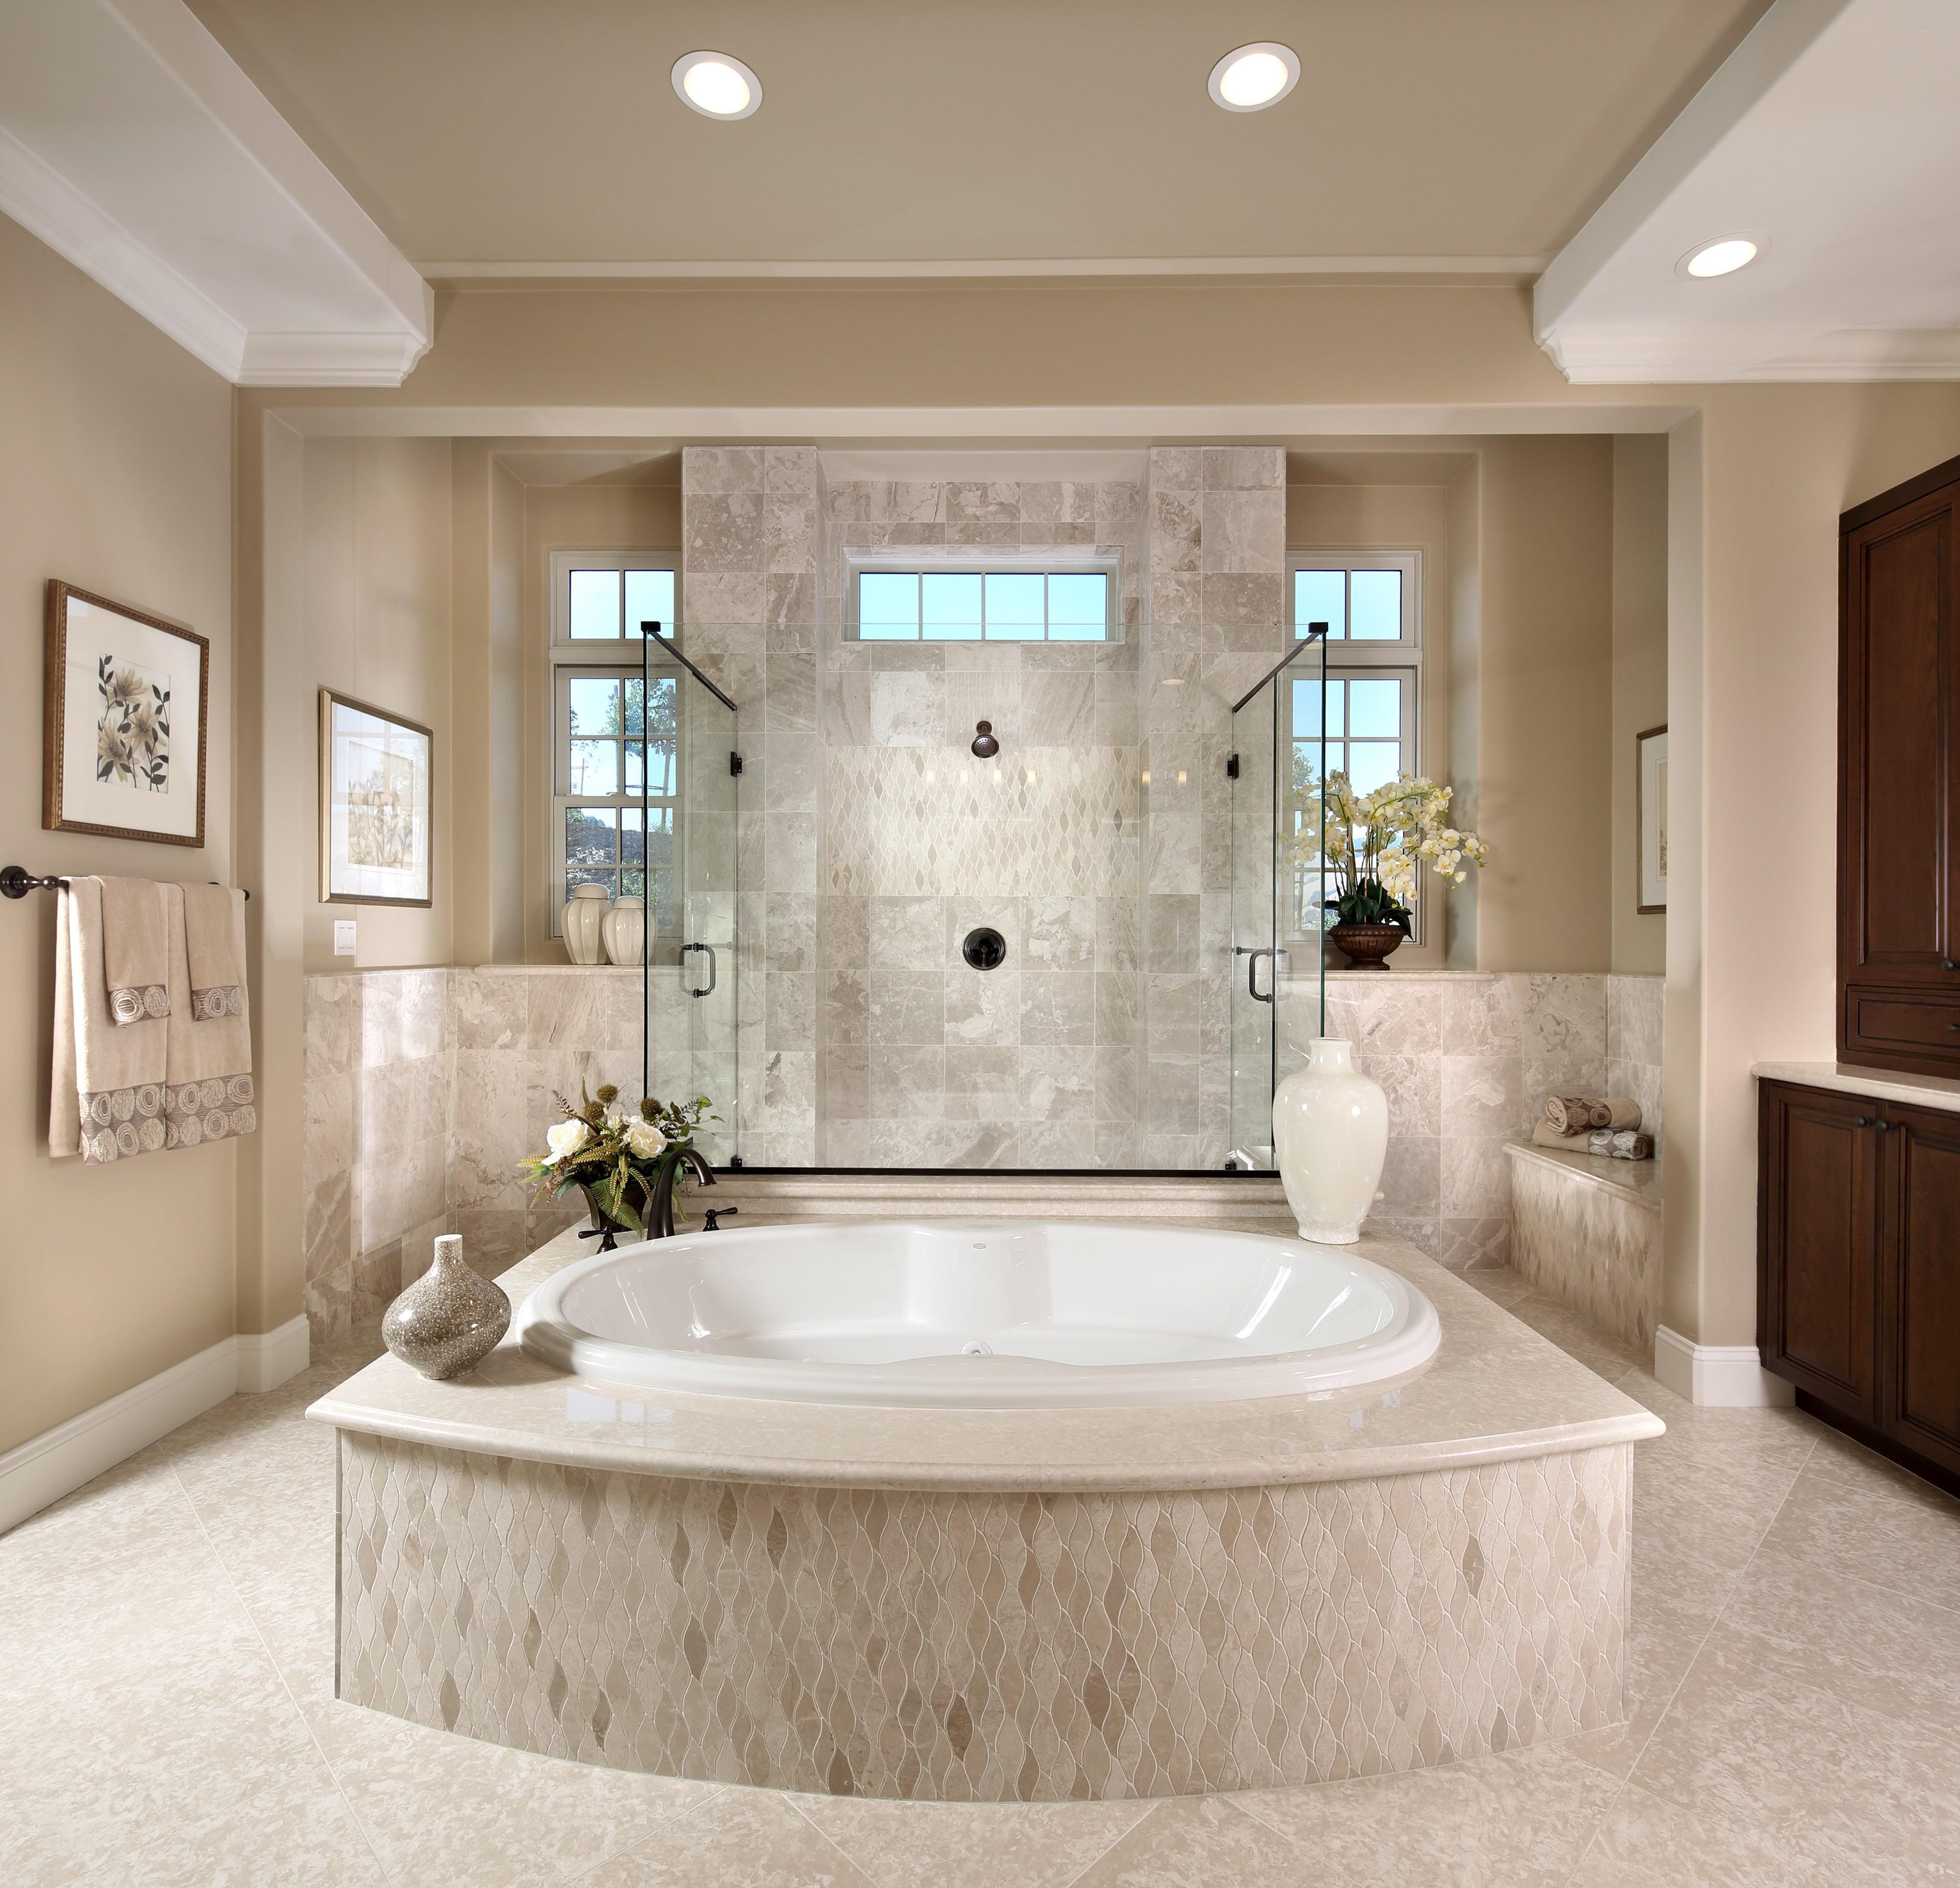 Bathtub   Elite Builder Services